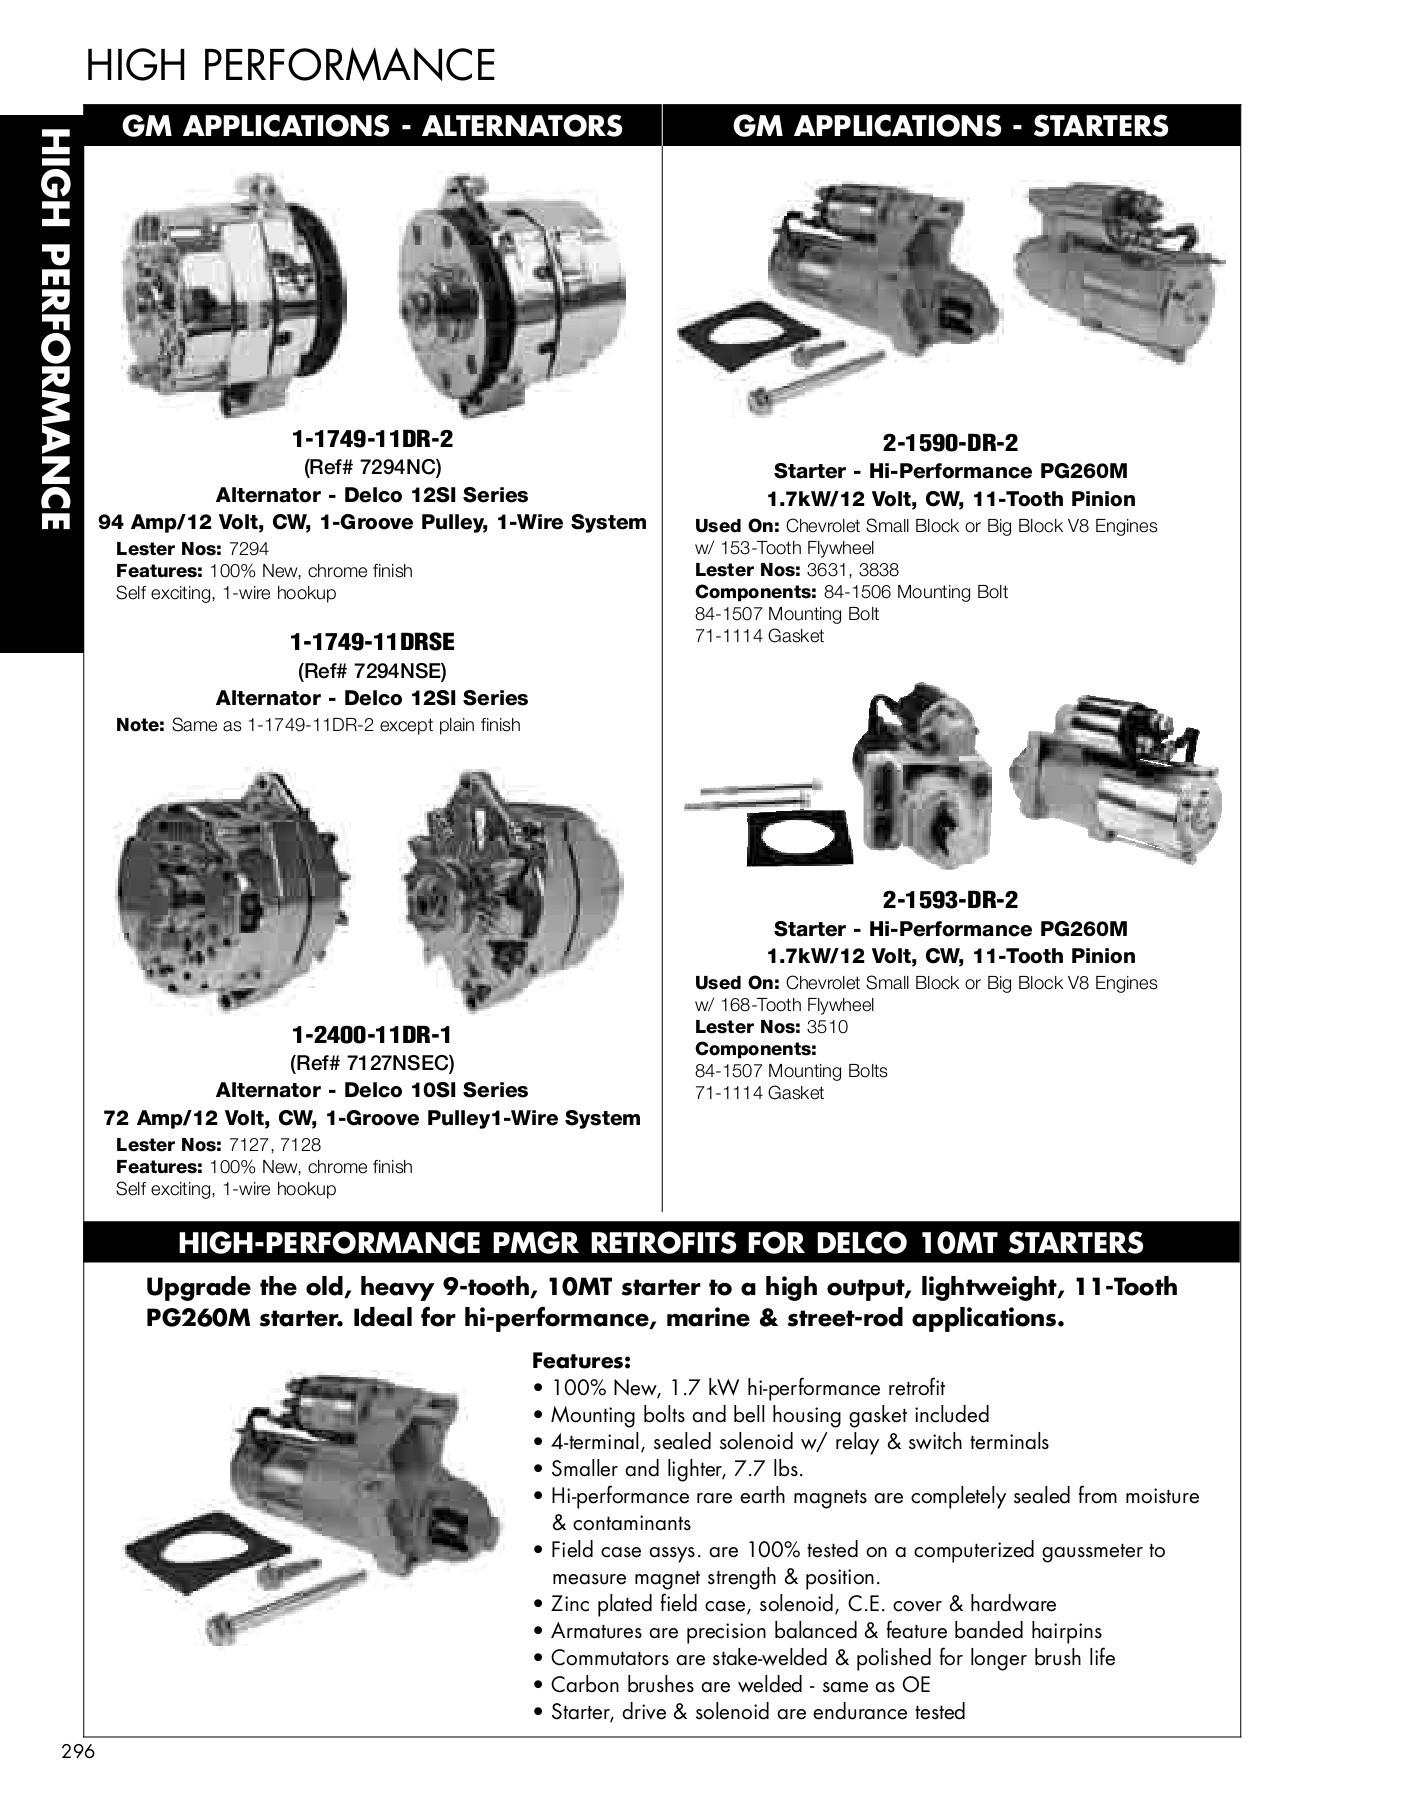 hight resolution of alternators starters generators motors domestic import pages 301 350 text version fliphtml5